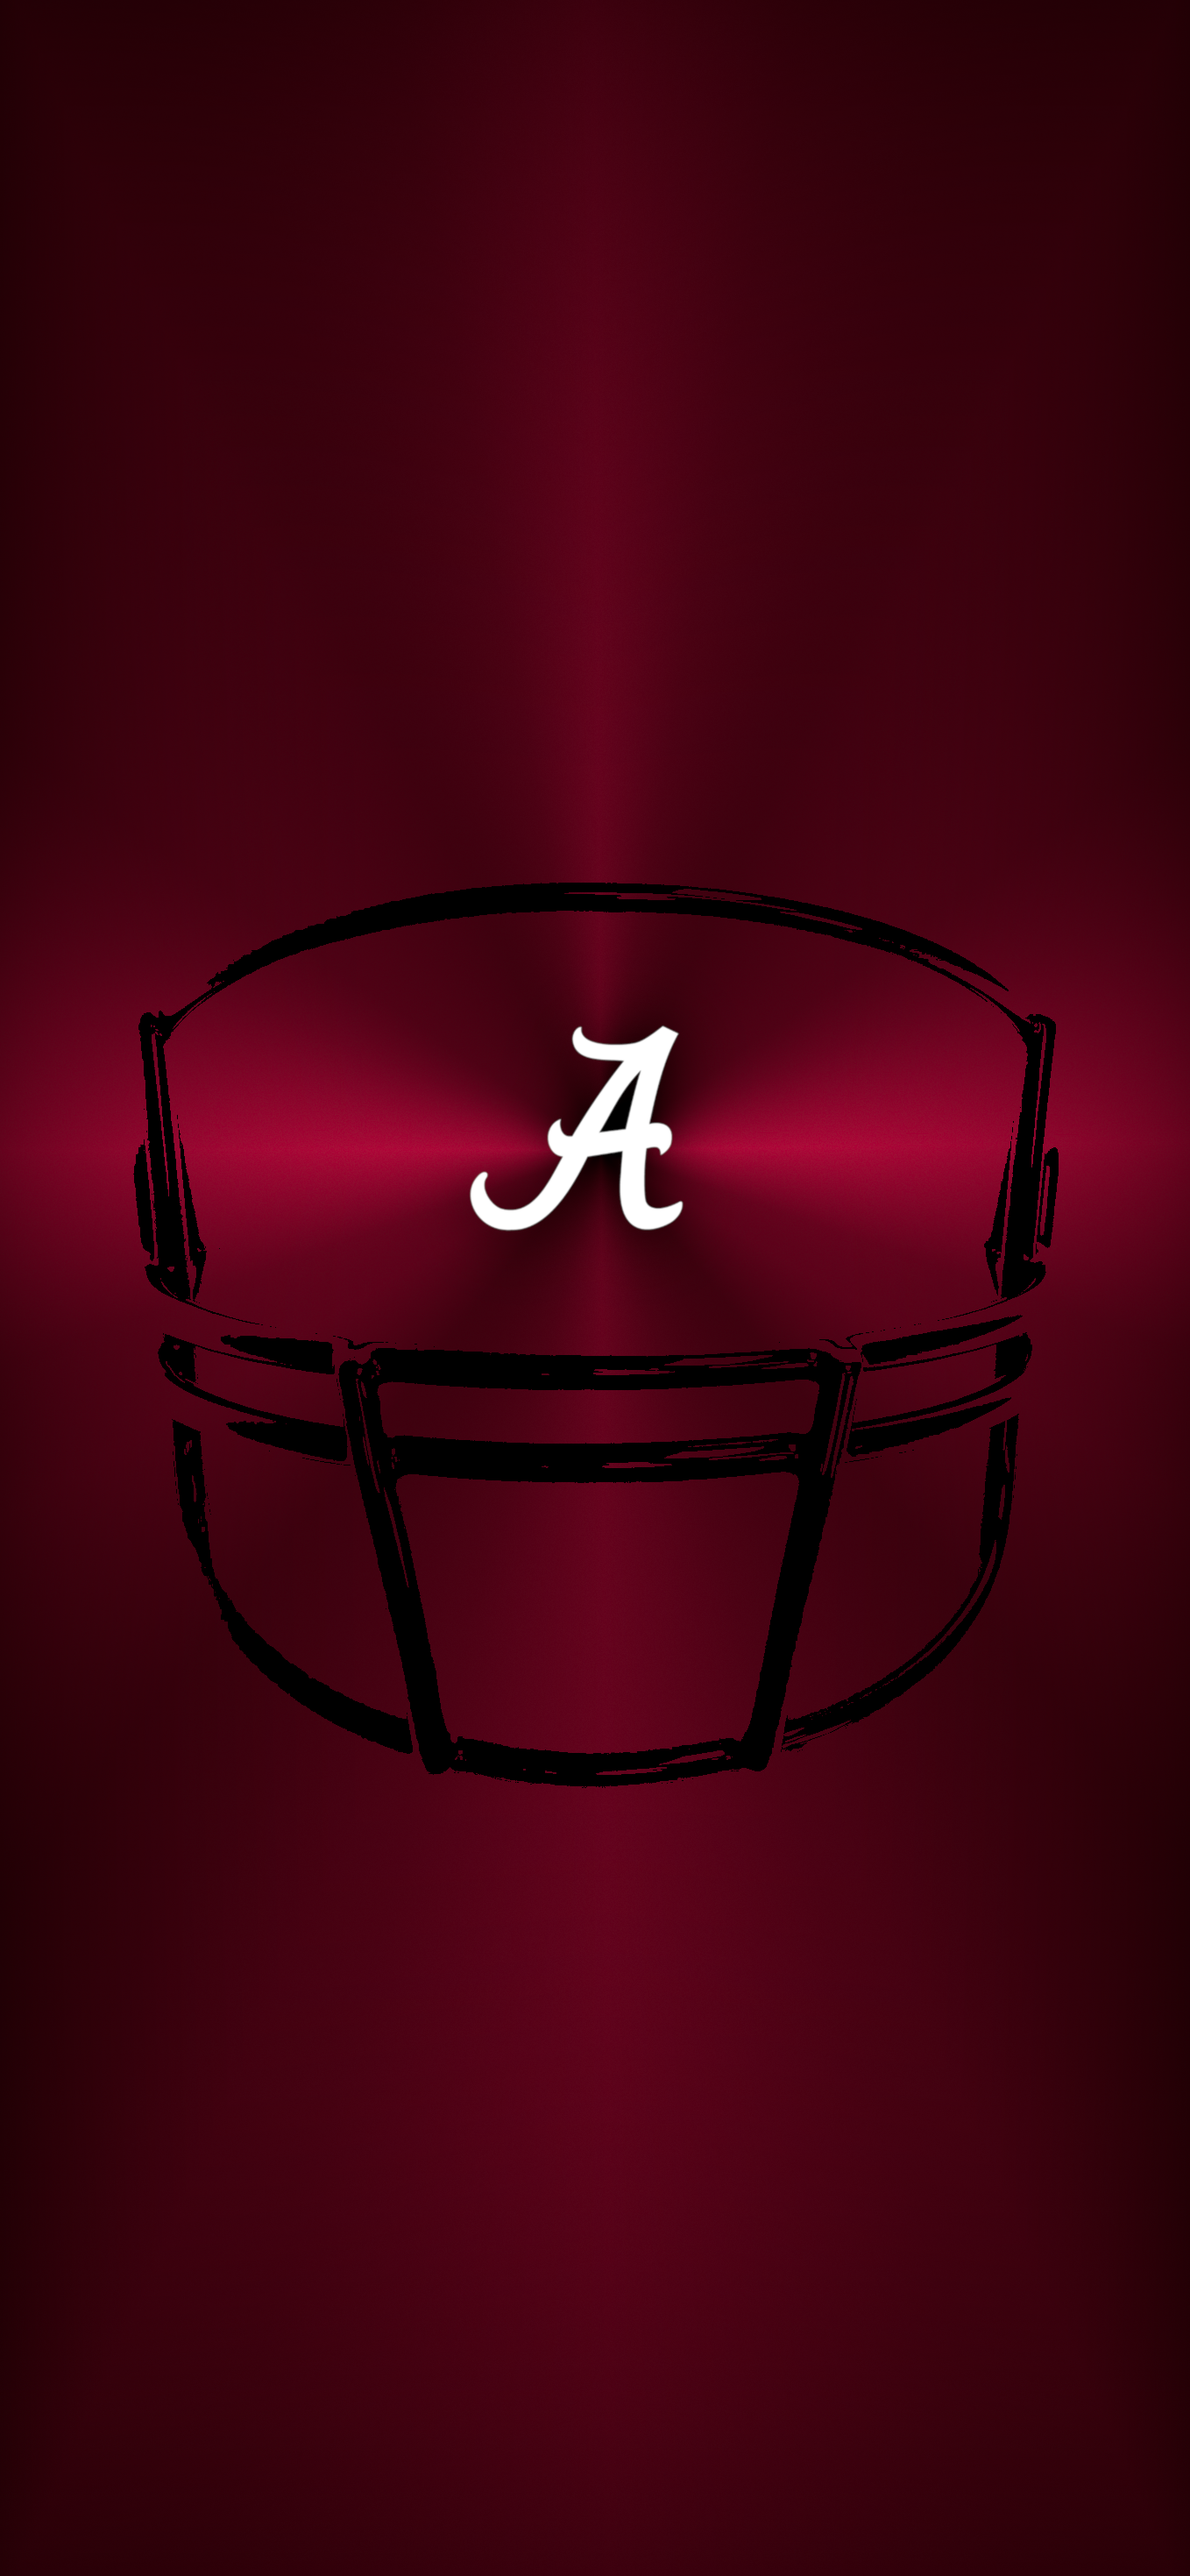 Cool Alabama Football Backgrounds Wallpaper Alabama Fondos De Pantalla Fondos Letras Minusculas